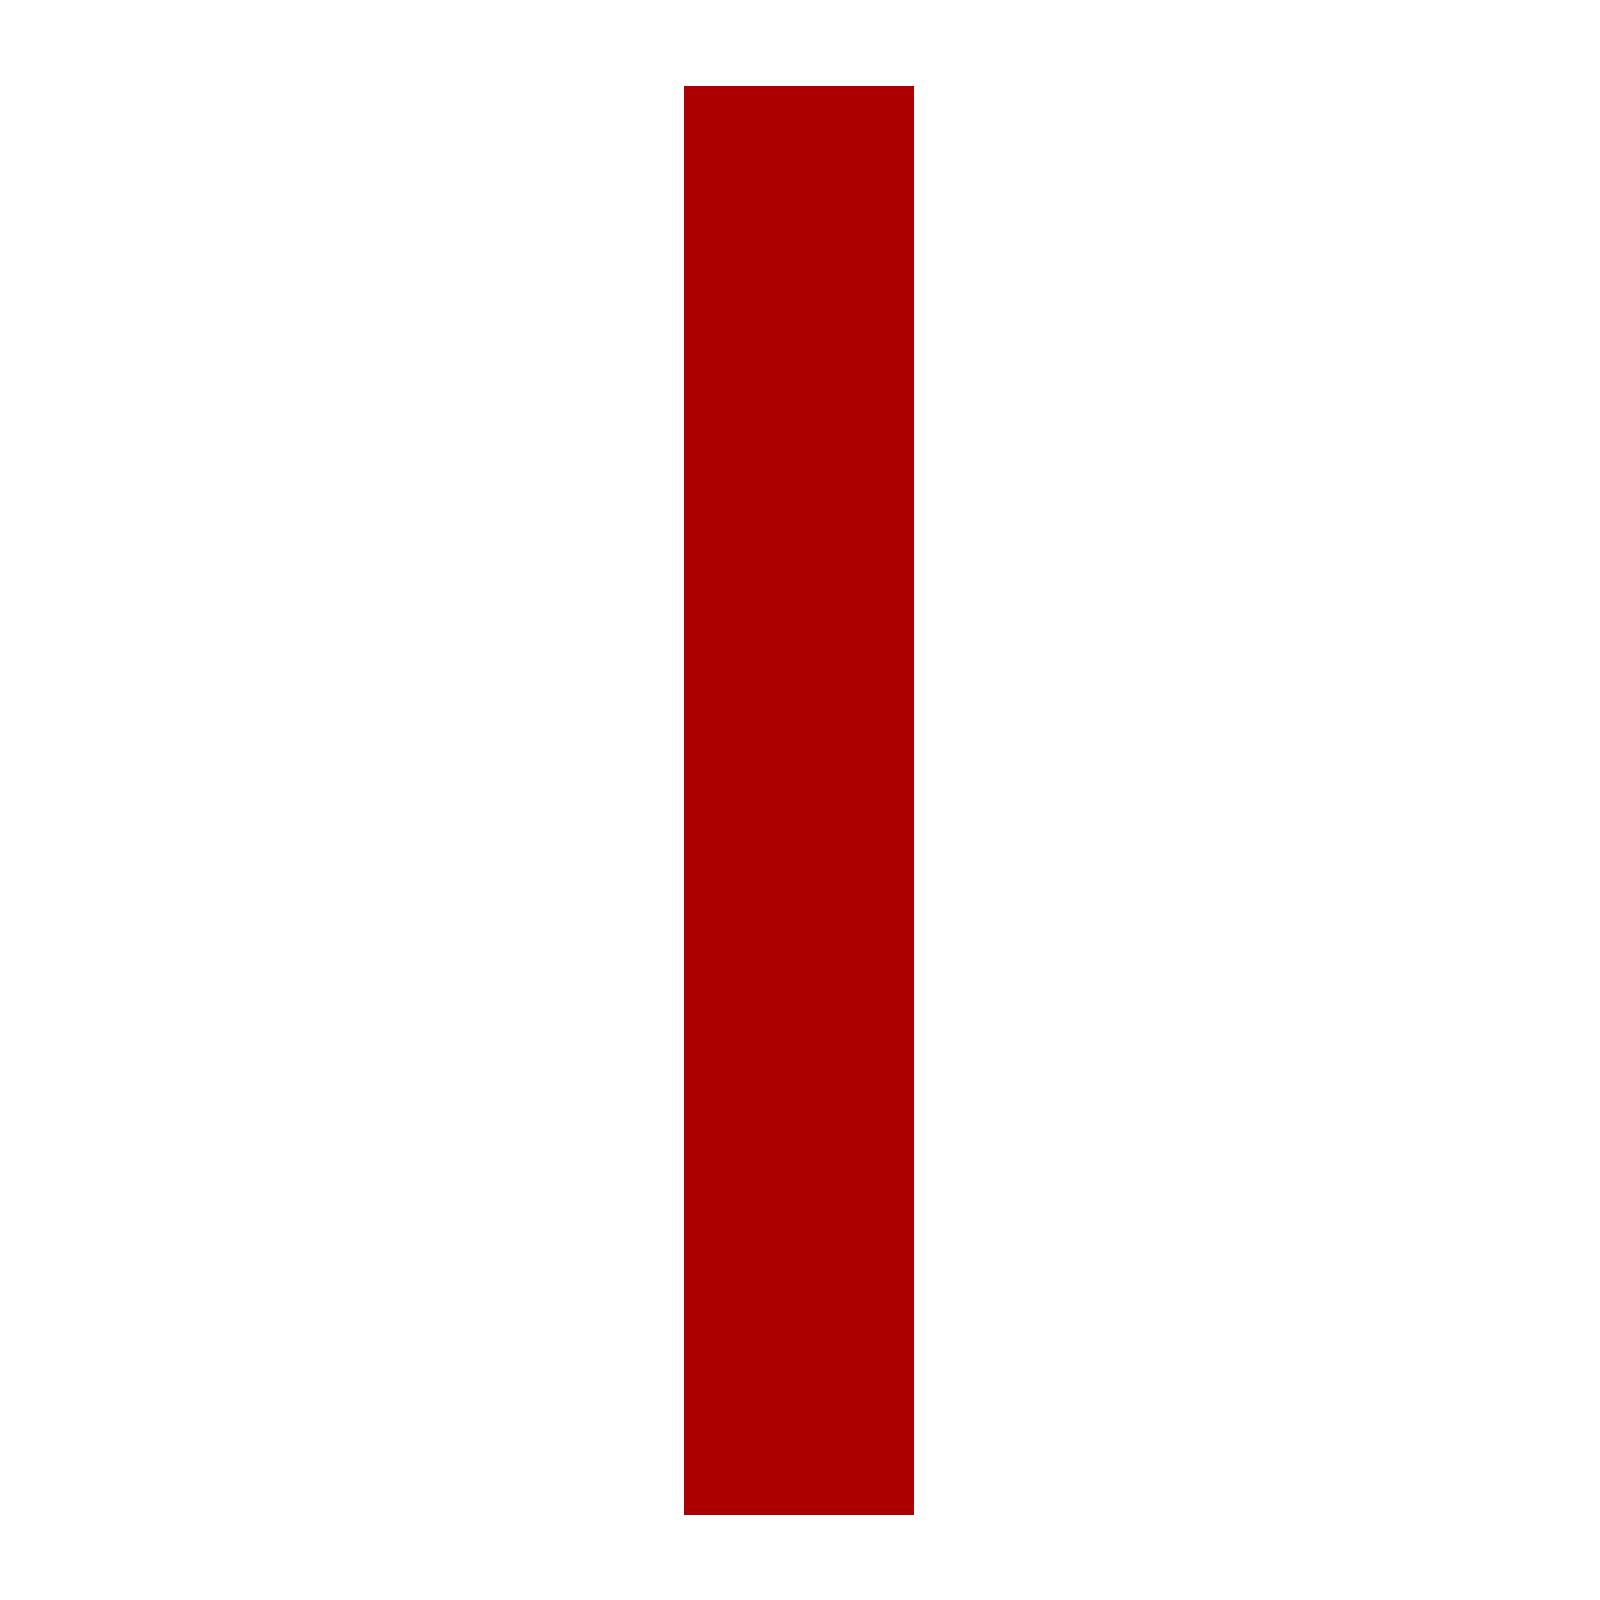 PSwDB Macbeth 2020 icon candle